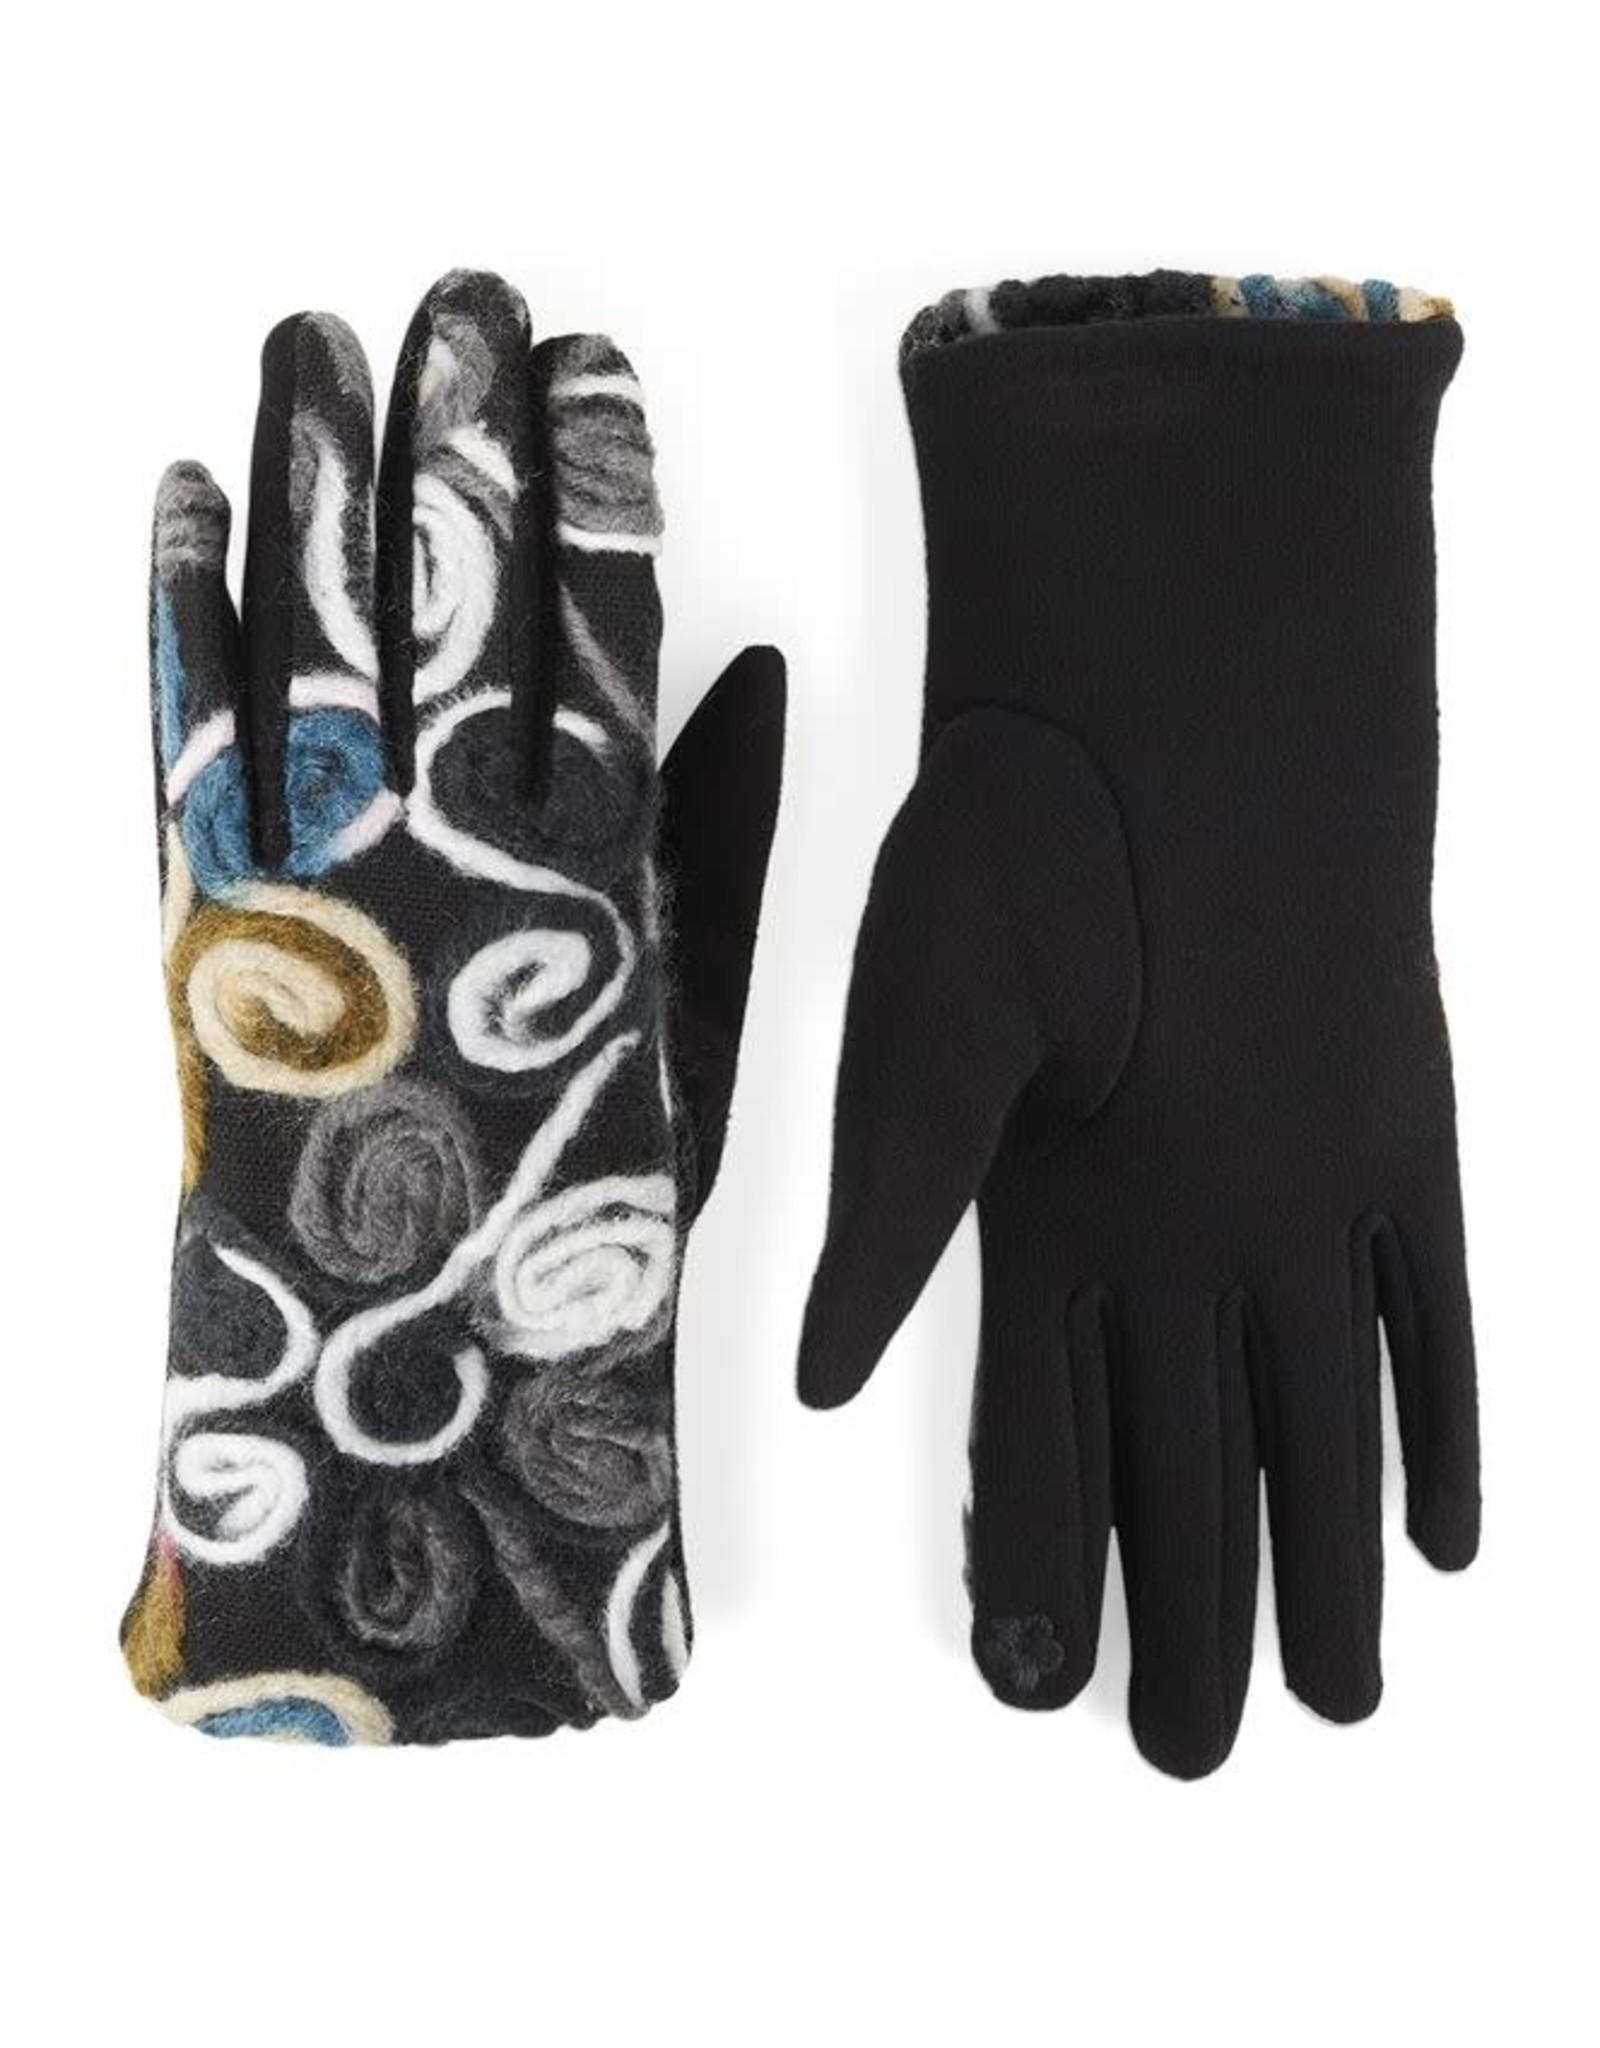 Coco & Carmen Bright Swirl Felt Touchscreen Gloves